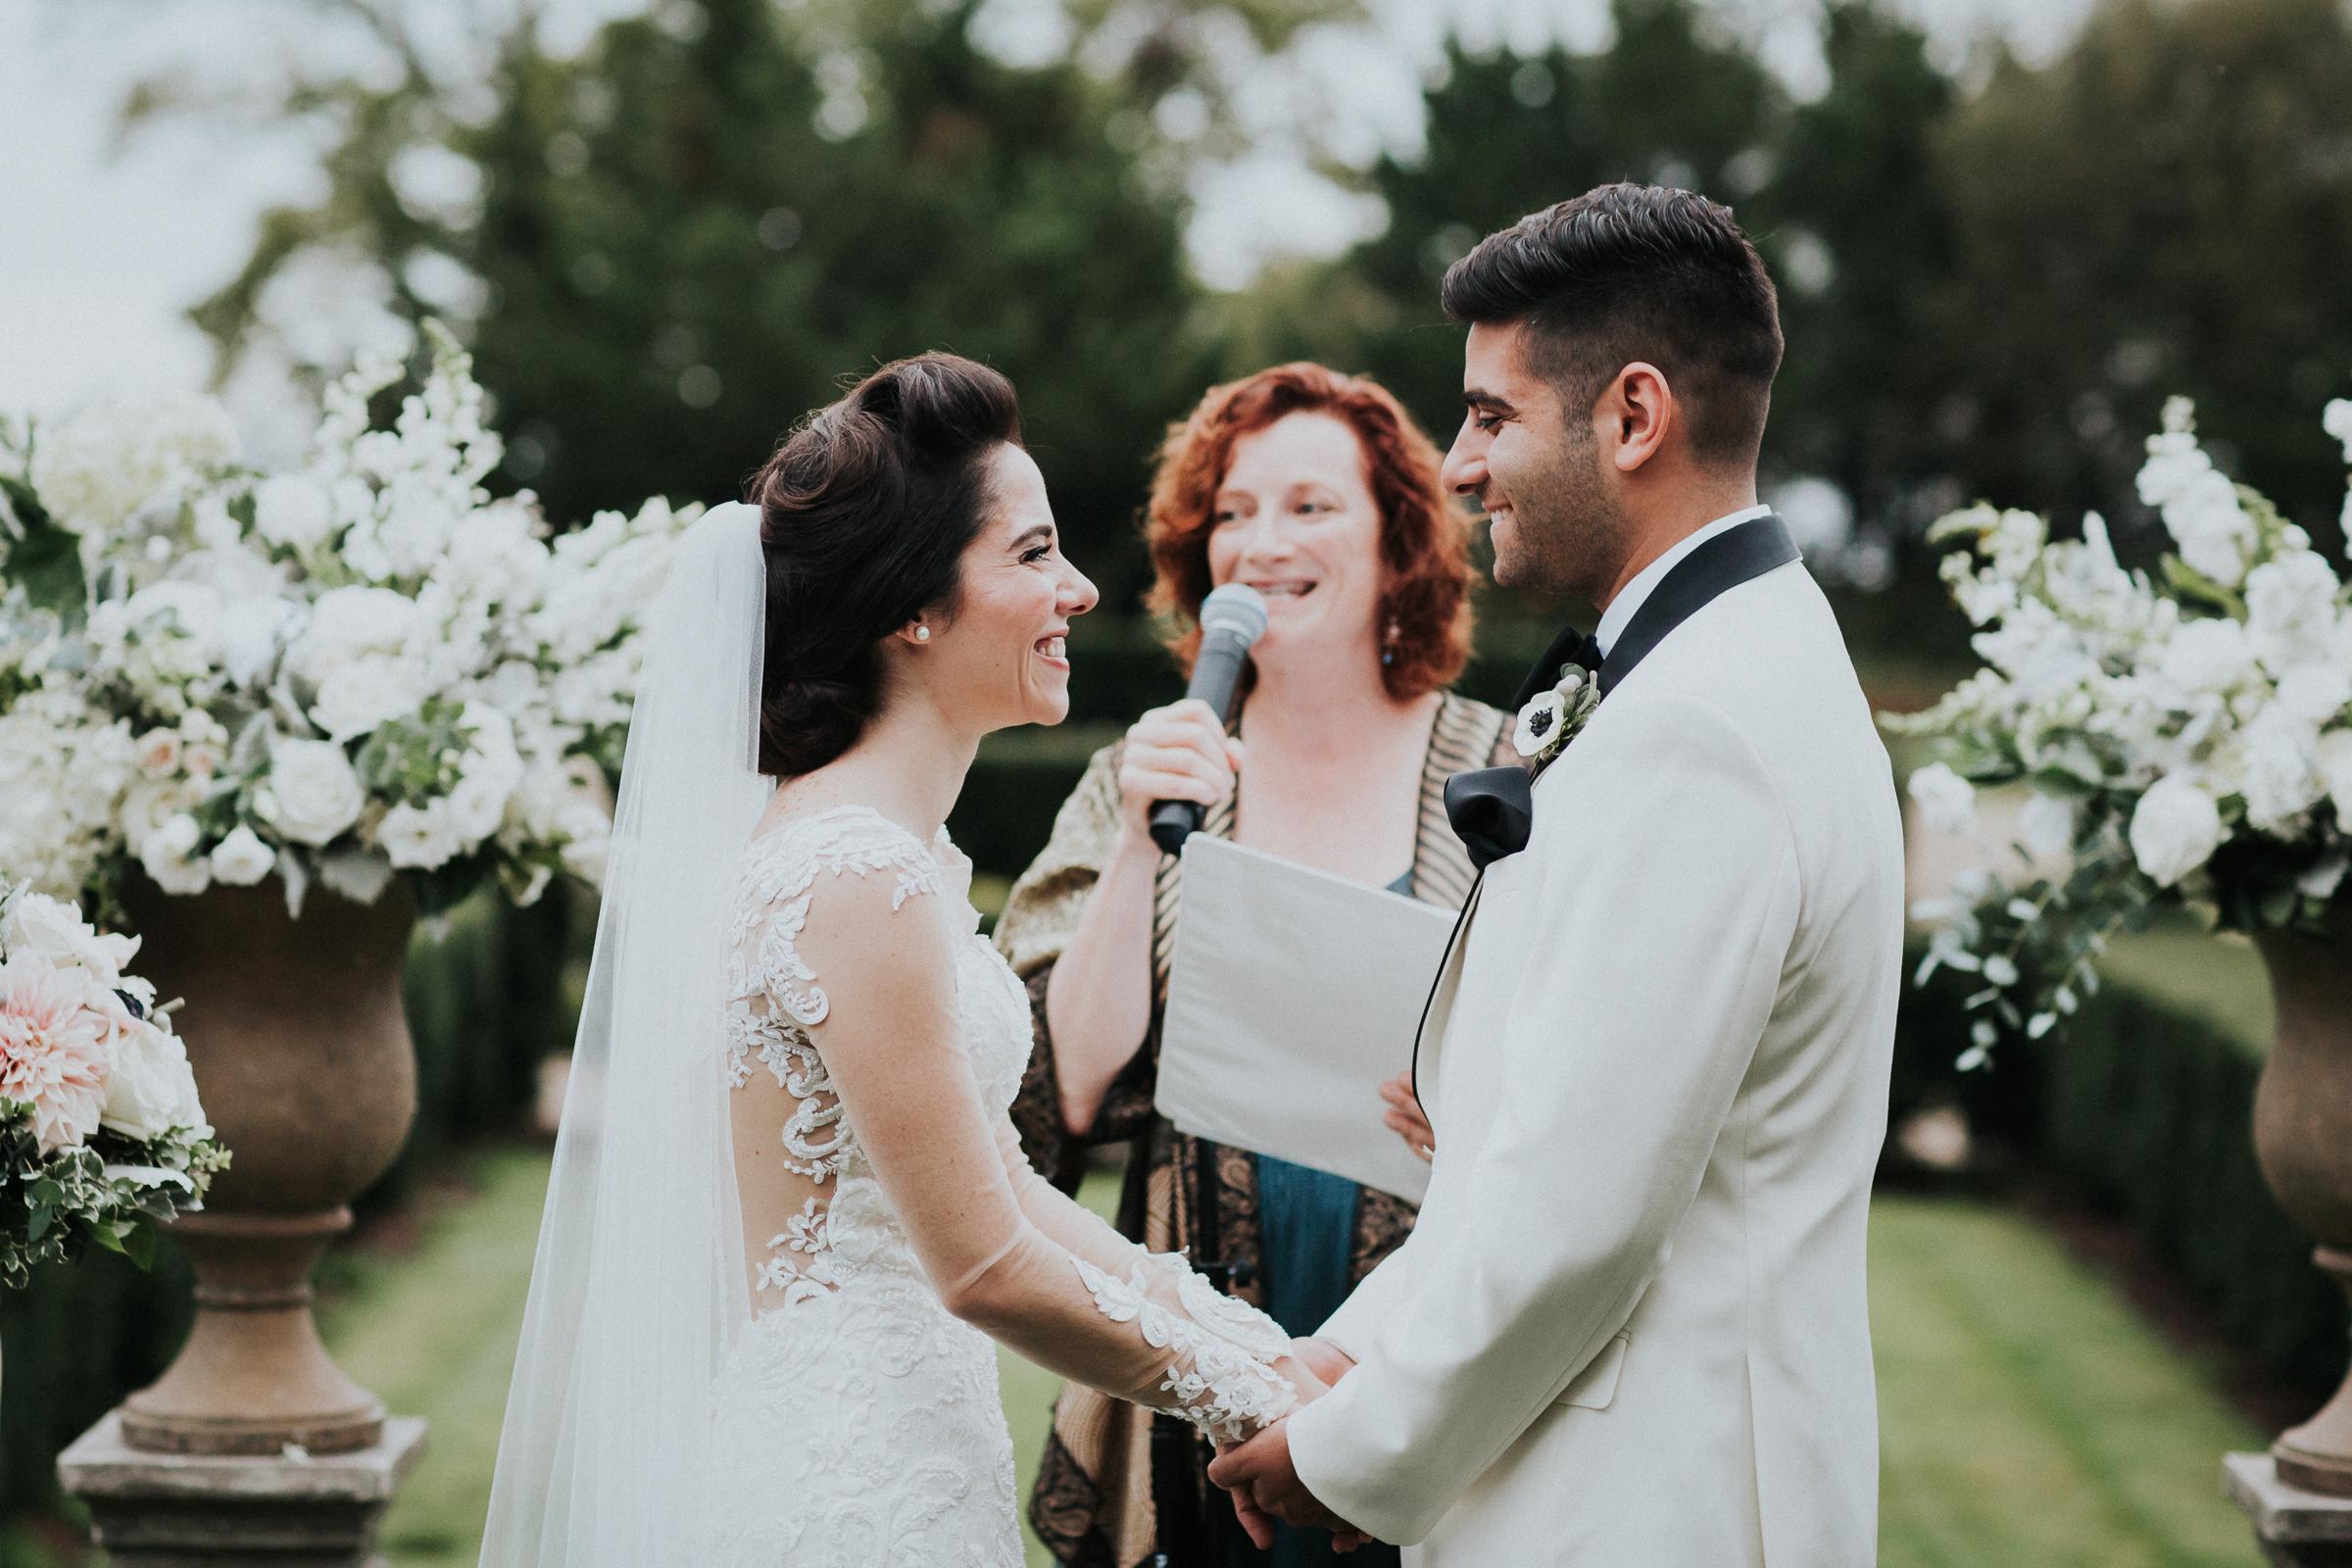 New-York-Documentary-Wedding-Photography-Best-Of-2017-by-Elvira-Kalviste-Photography-104.jpg